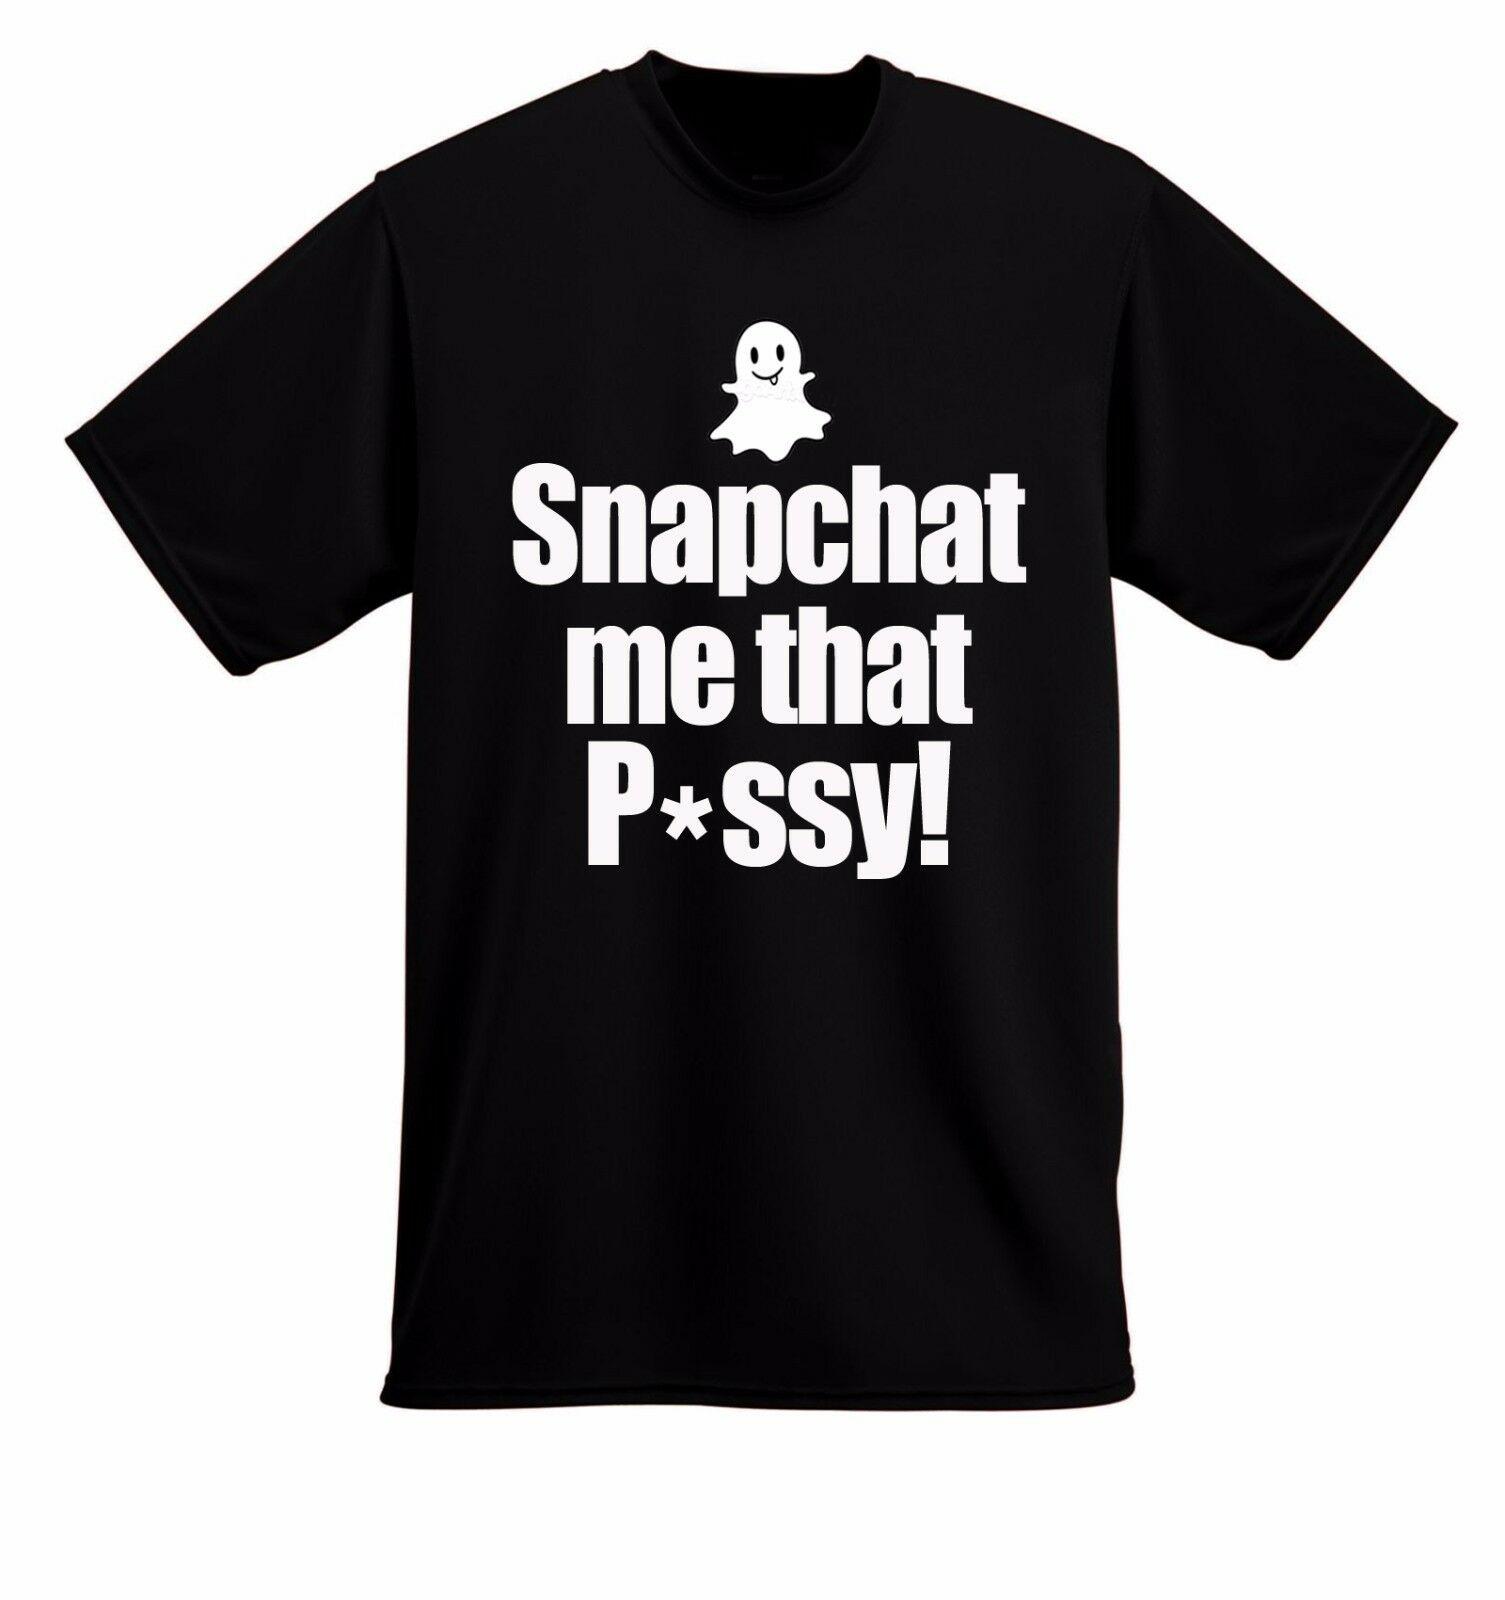 ¡Yo Gotti SNAPCHAT ME P * SSY! IT GOES DOWN IN THE DM camiseta S-6X hombres, mujeres sueltas Negro hombres camisetas Homme